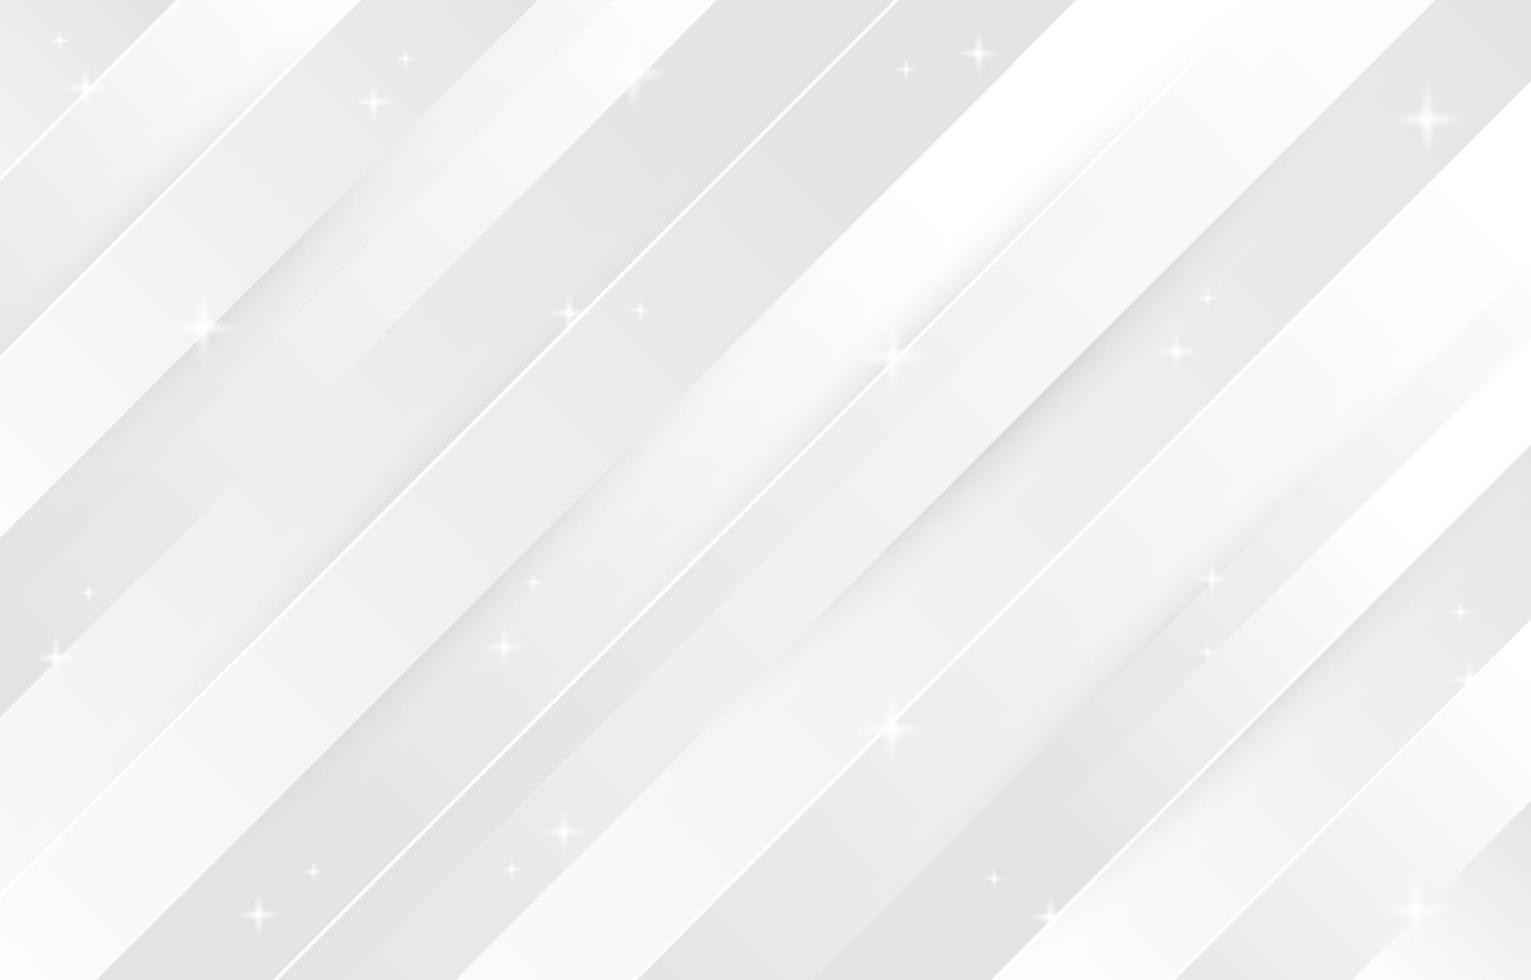 Elegant Luxurious White Background vector